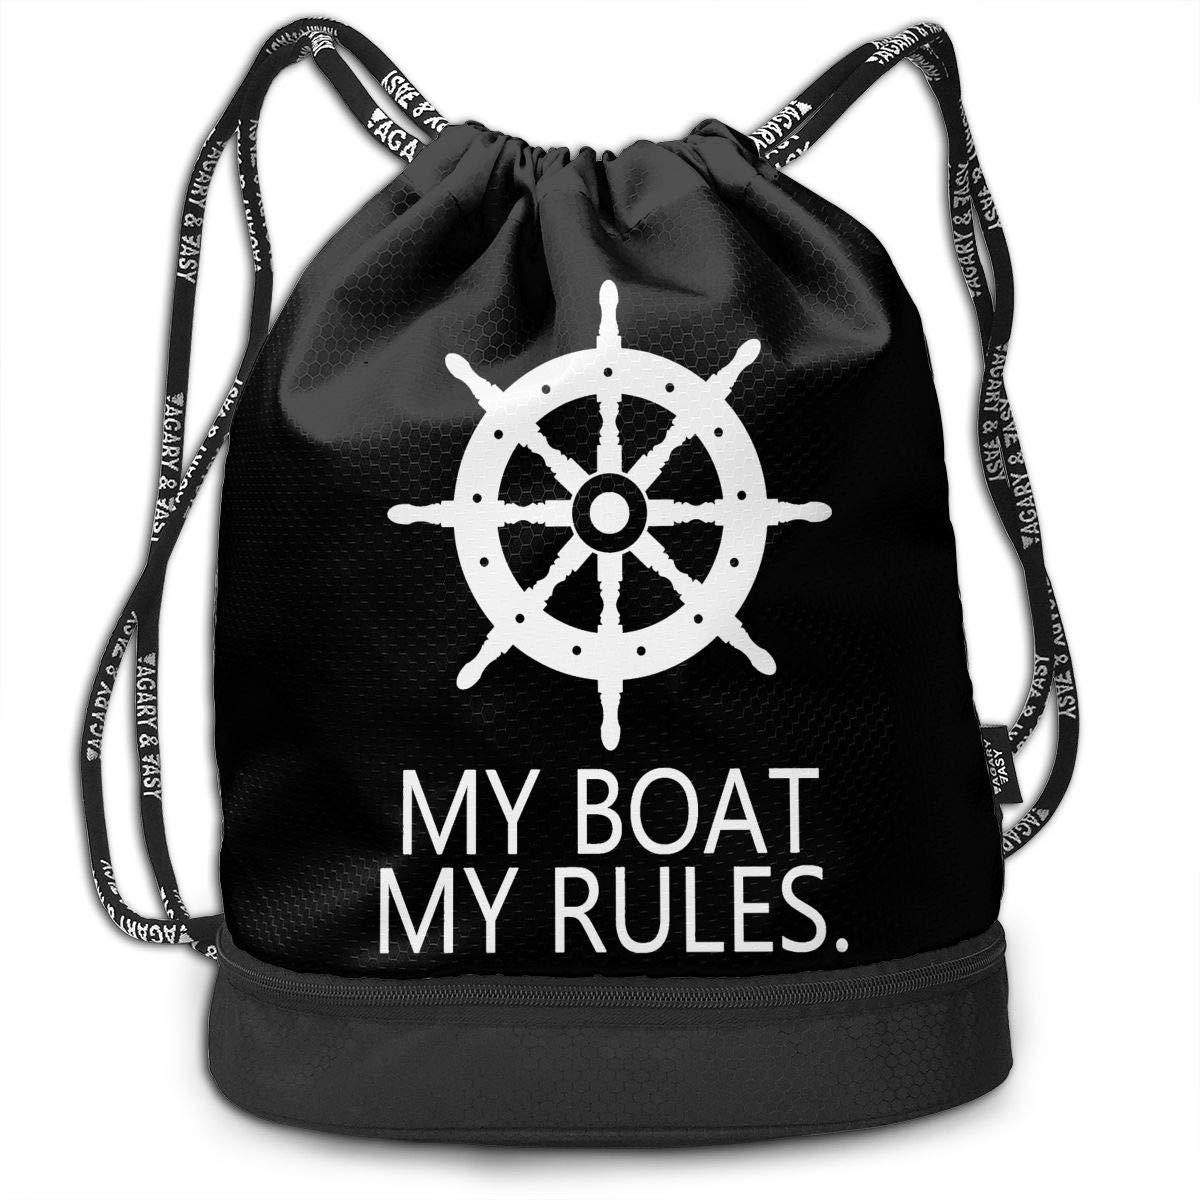 HFTIDBC My Boat My Rules ストリングバックパック シンチサック   B07KPTDB6D